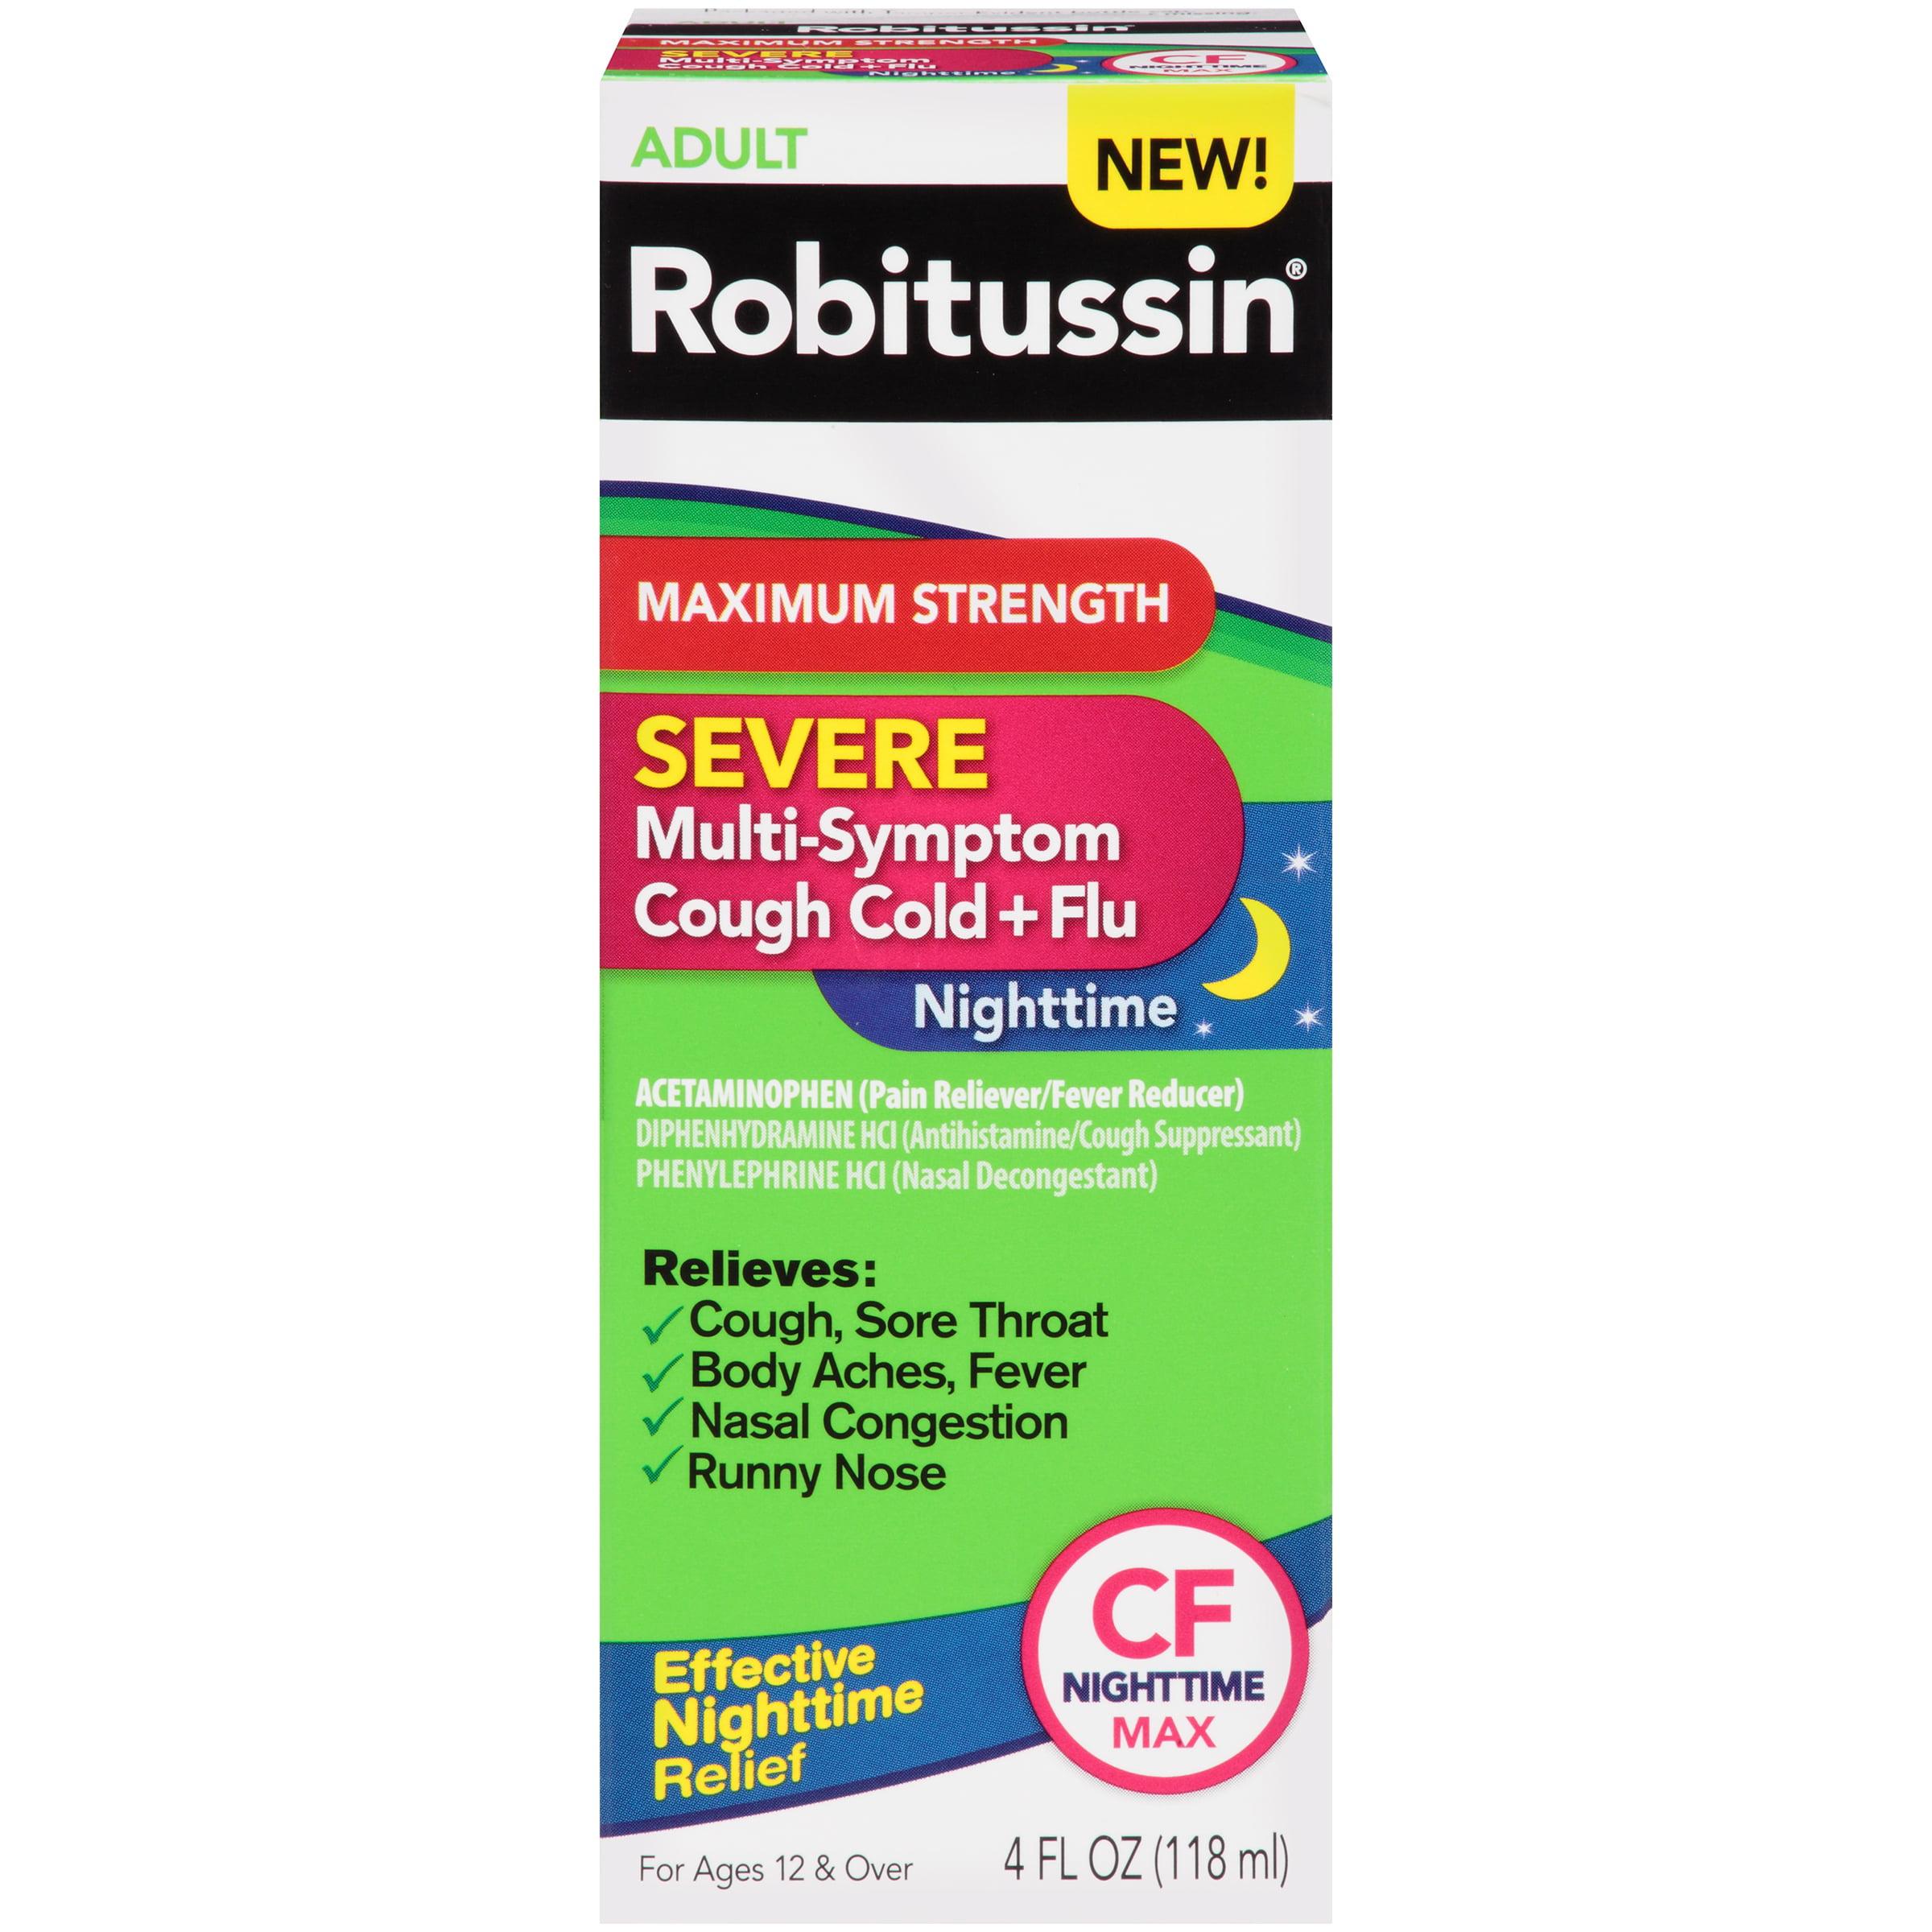 Robitussin Adult Severe Multi-Symptom Cough Cold + Flu CF Nighttime Max, 4.0...